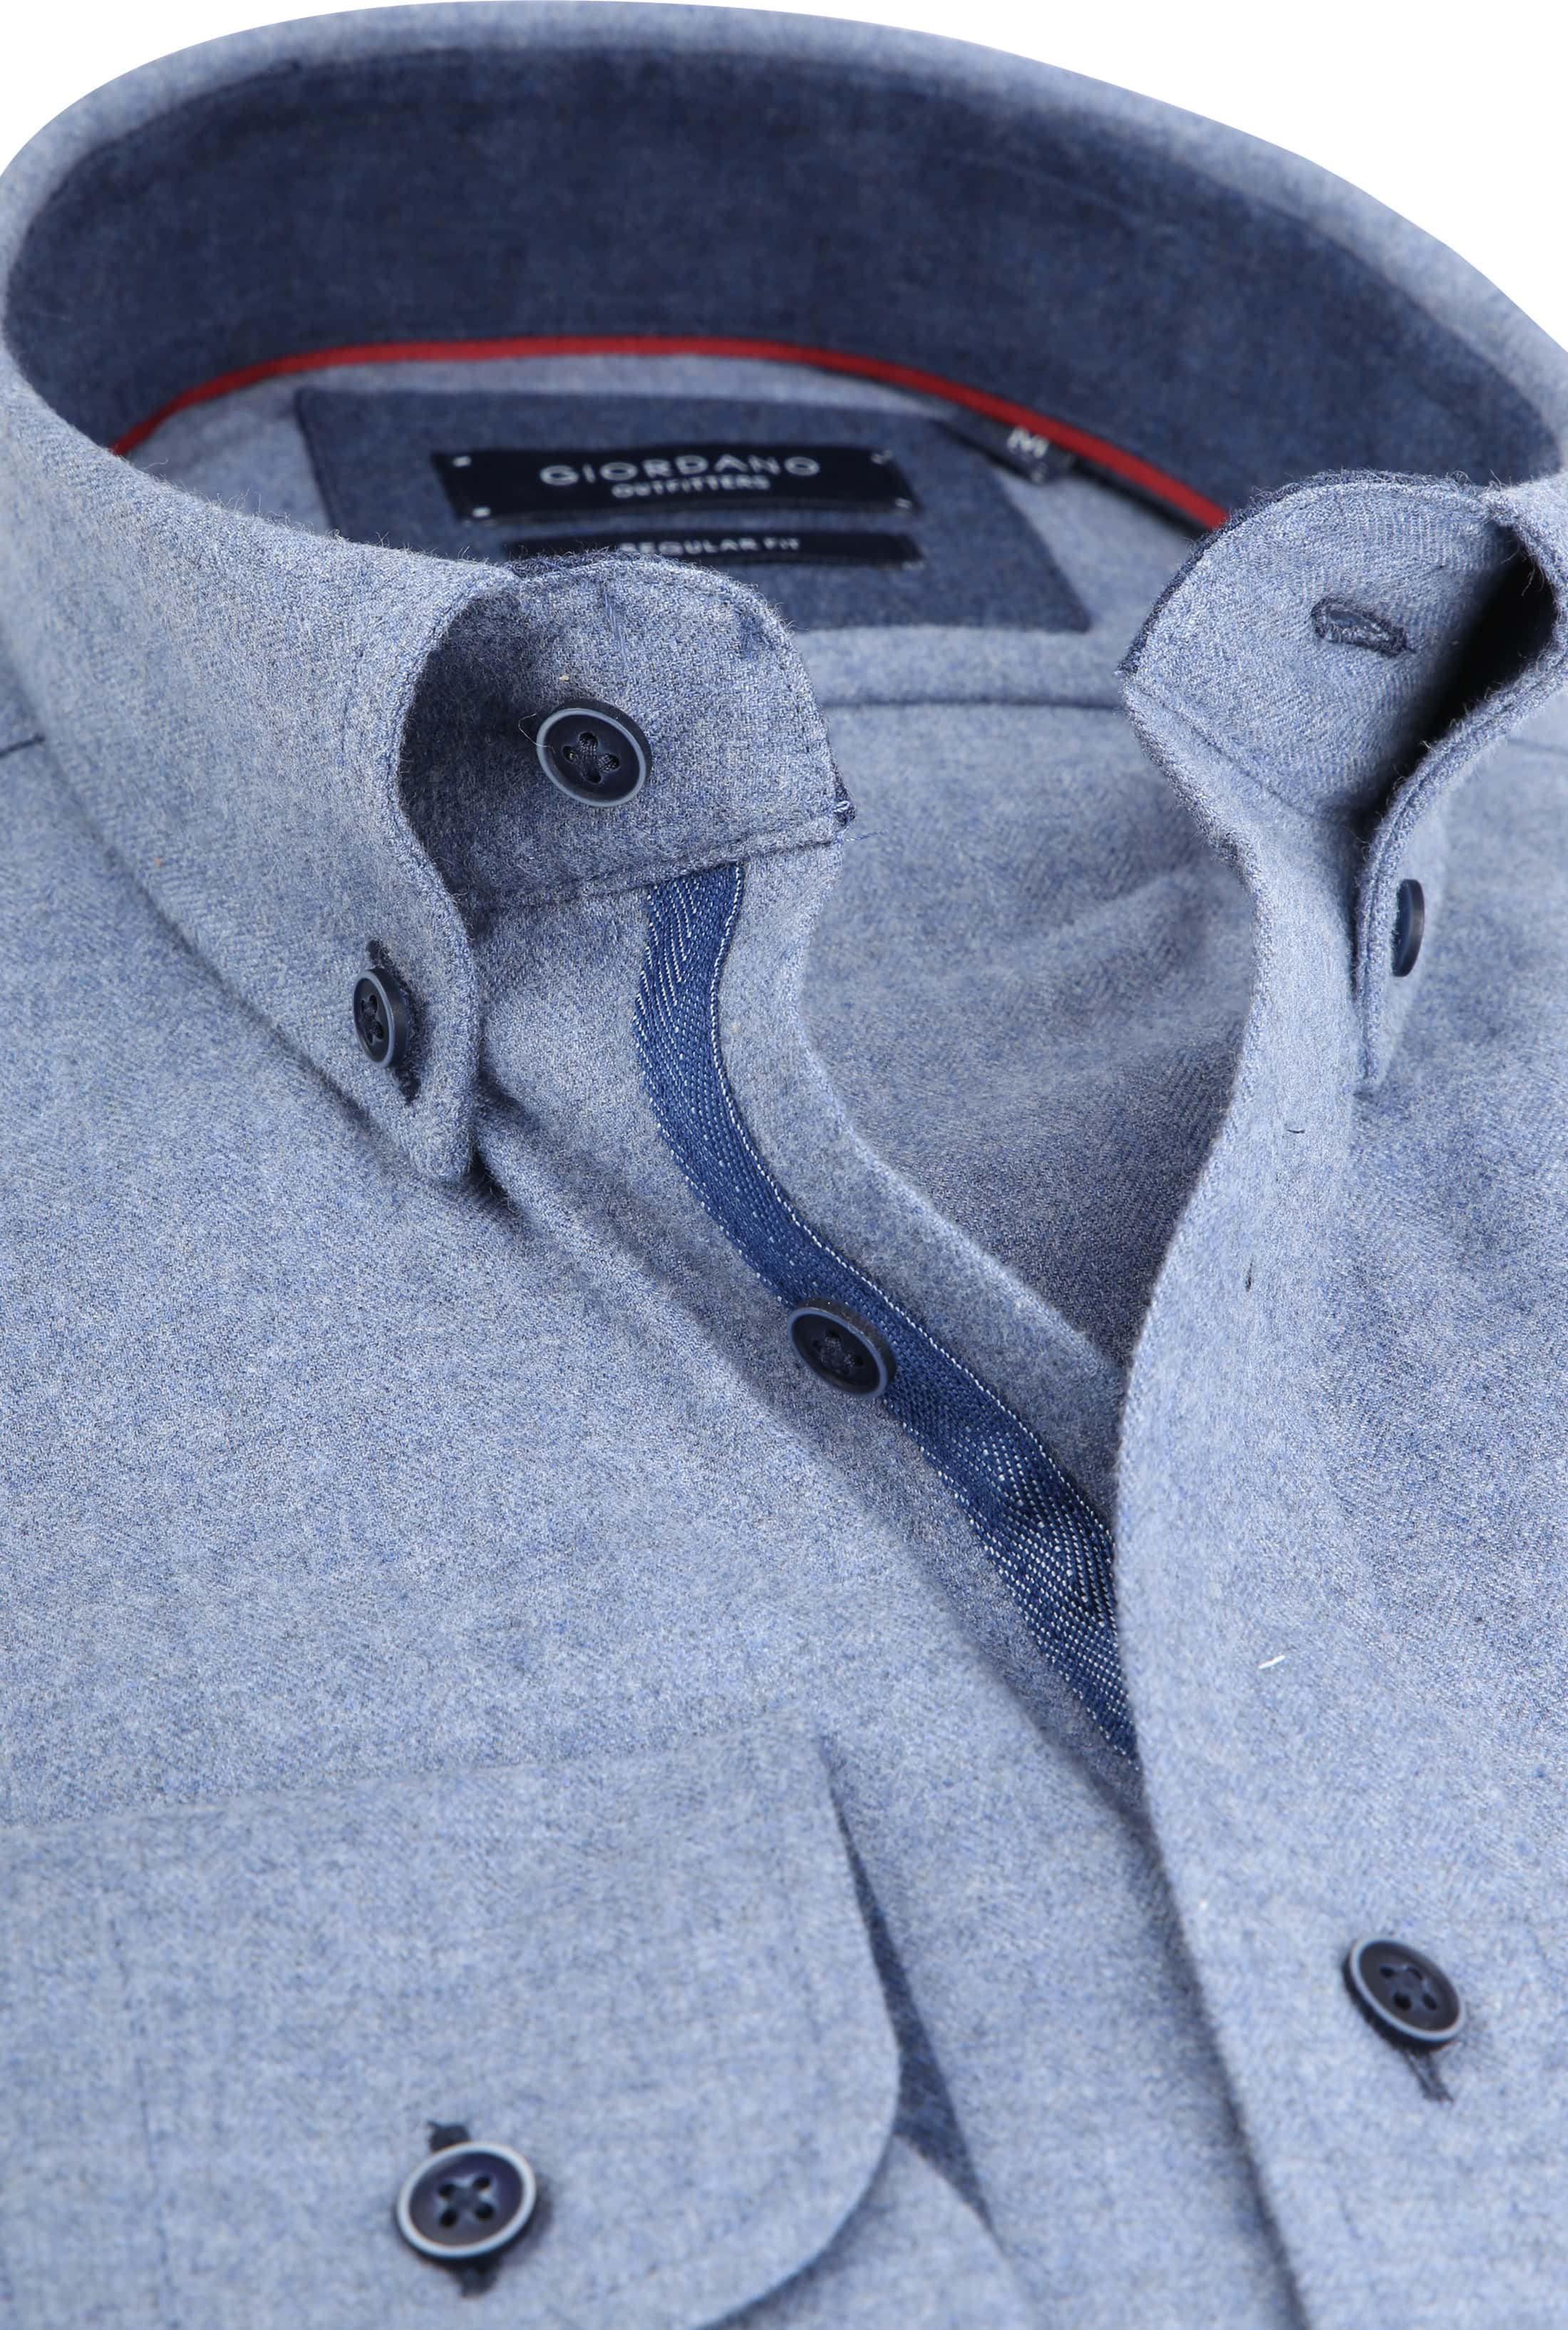 Giordano Kennedy Shirt Melange Blue foto 1